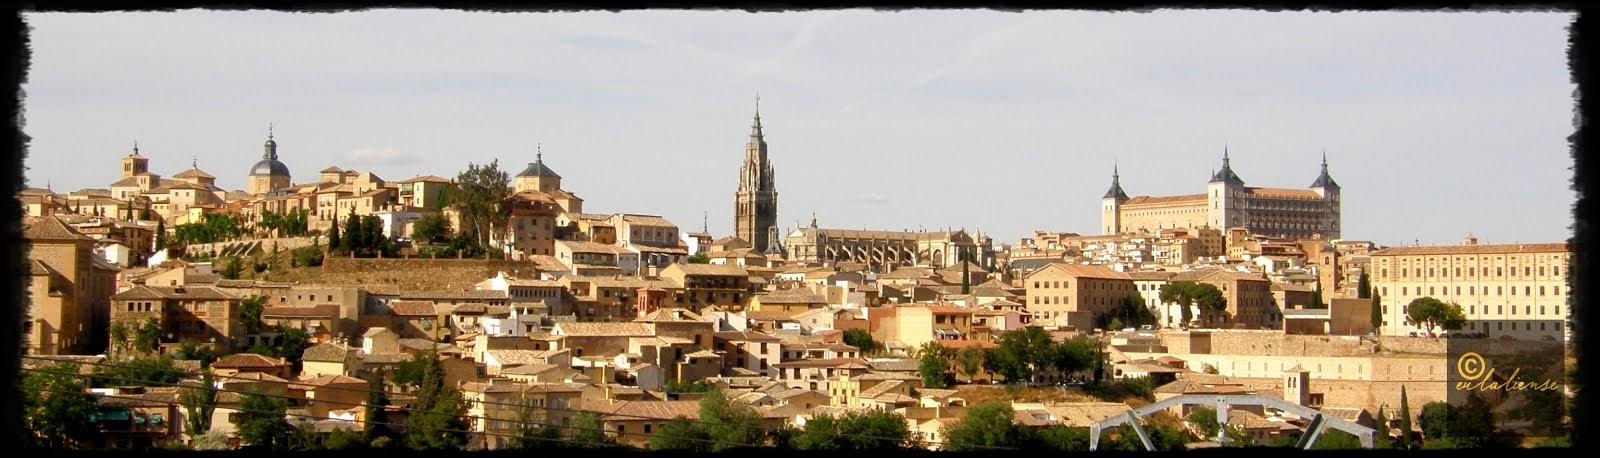 | Vista de Toledo |